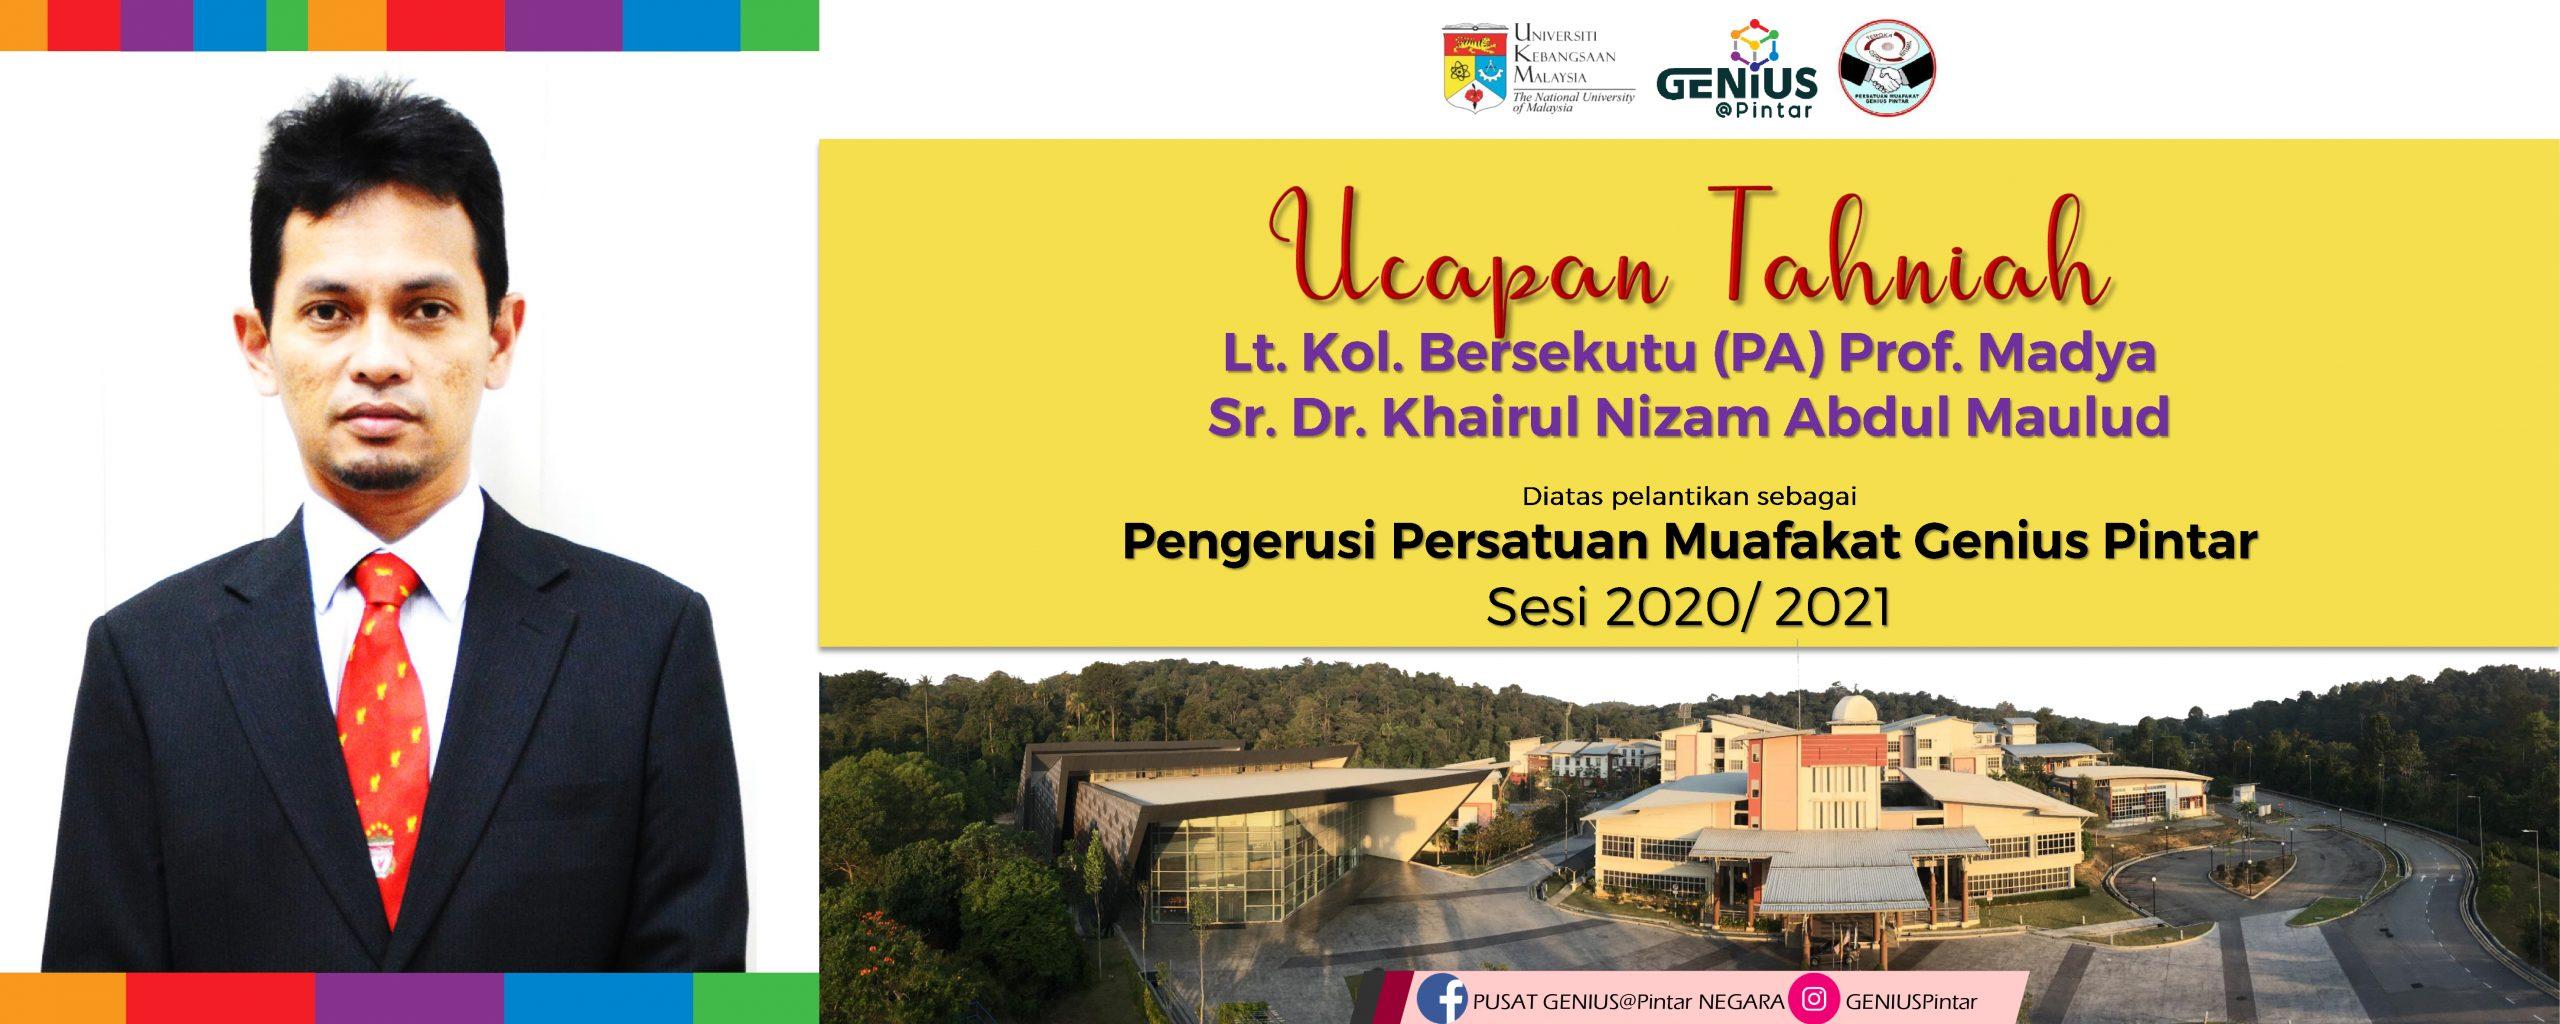 Pengerusi Persatuan Muafakat Genius Pintar Sesi 2020/ 2021